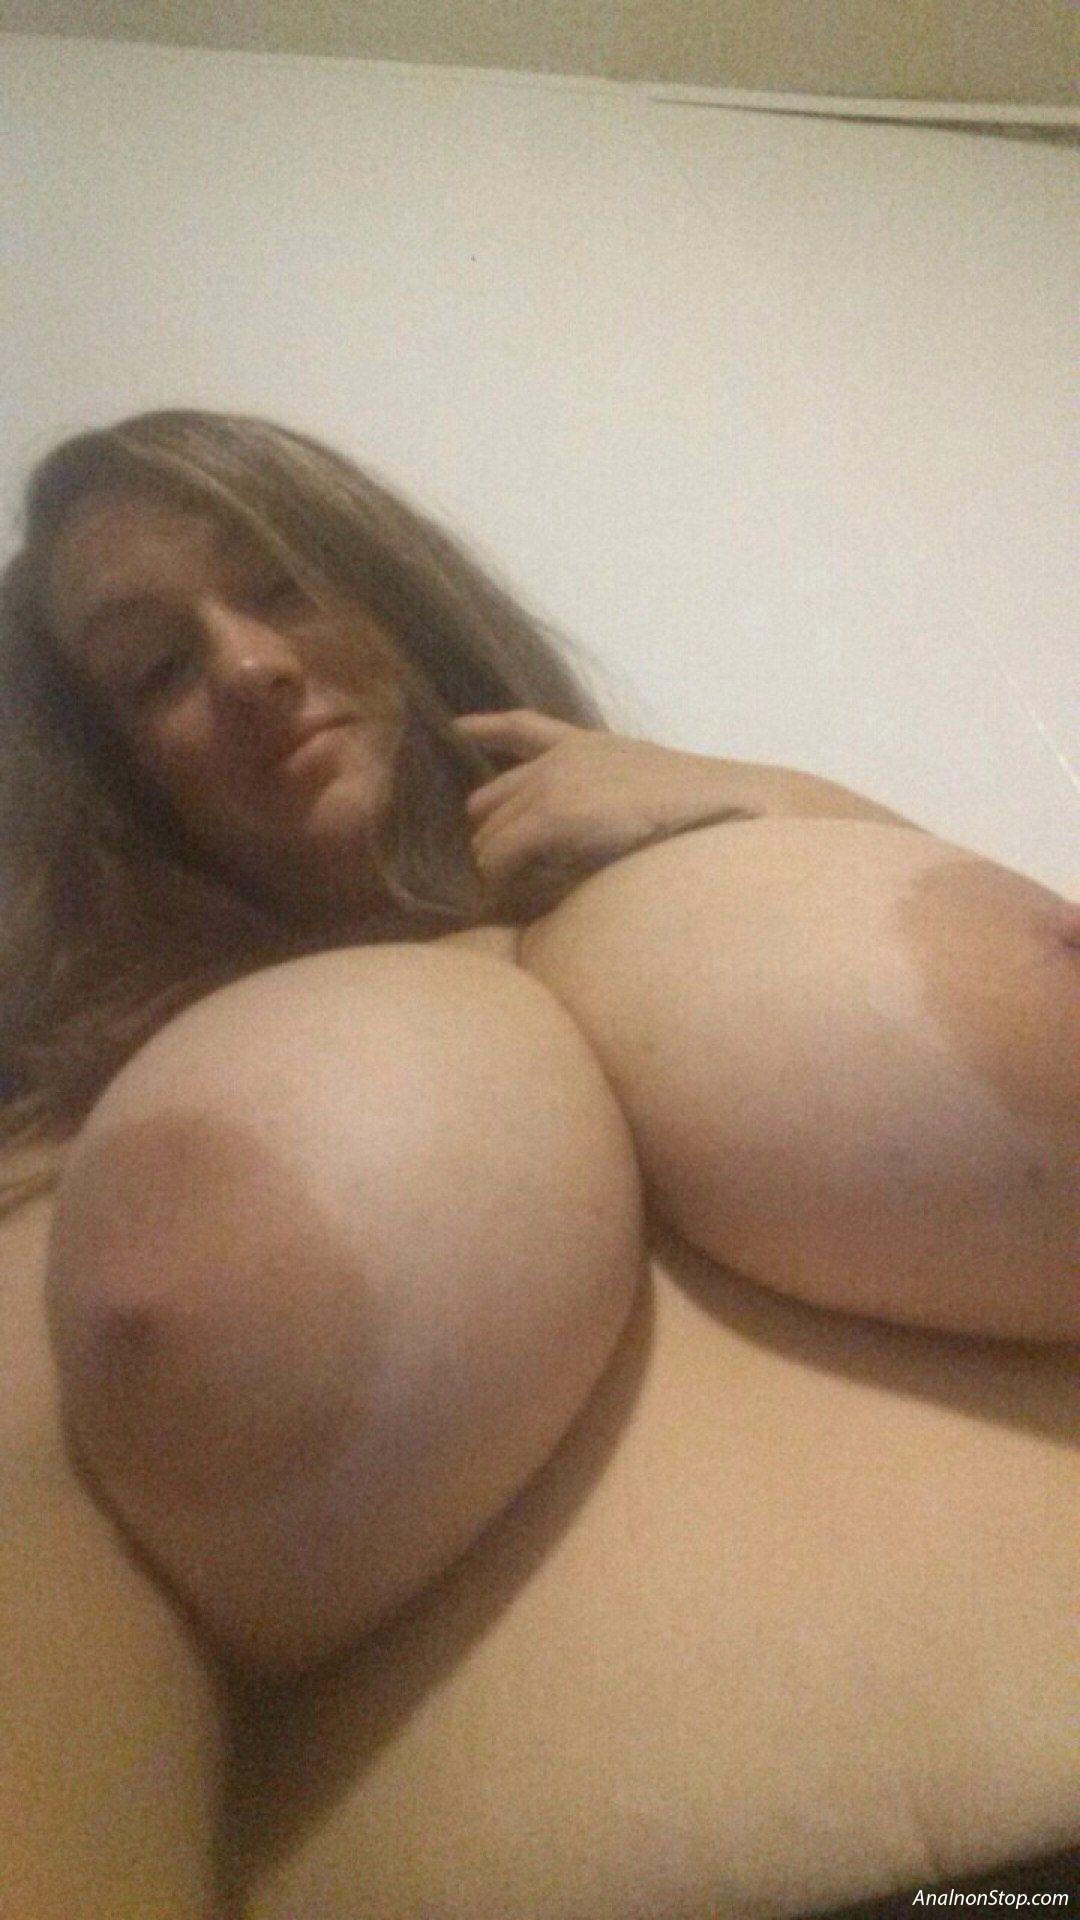 Порно актрисы - pornolavka.net